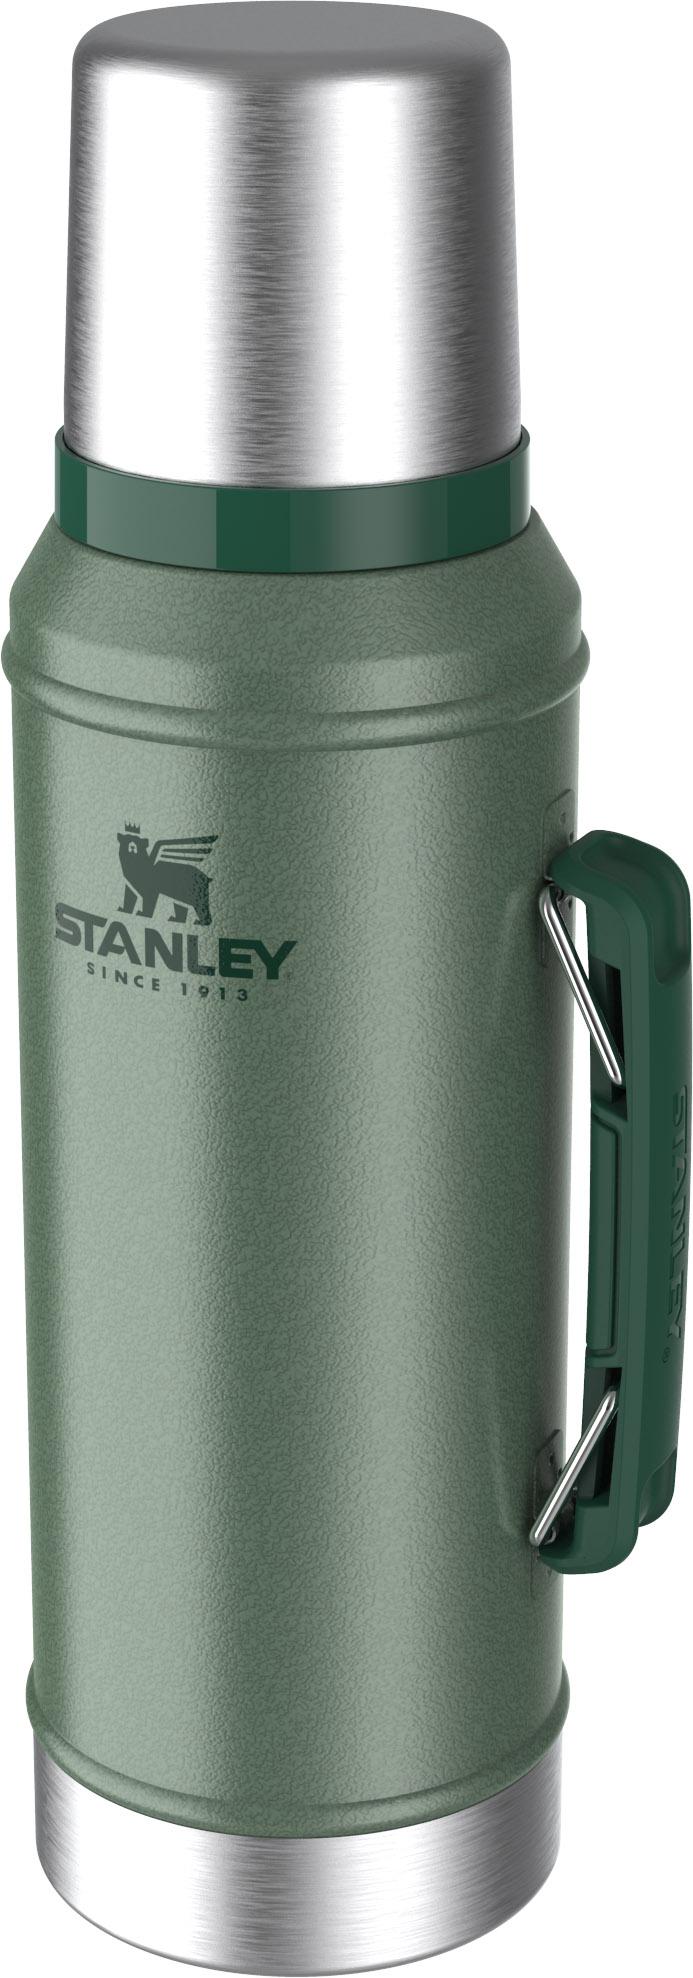 Garrafa Classic Inox Verde 0,95 c/Rolha Precisao Stanley